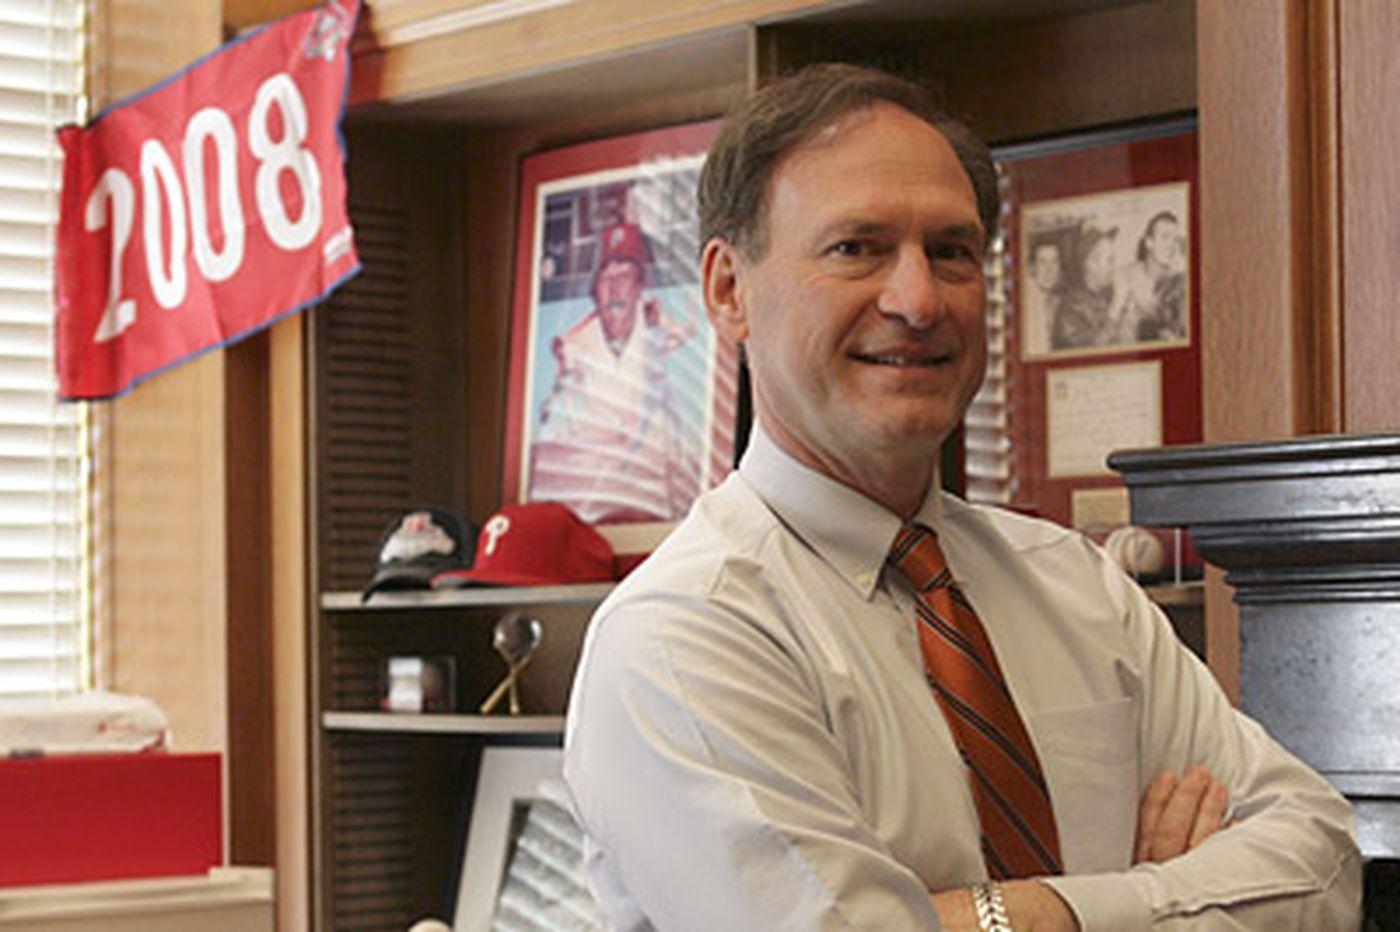 Q&A with Justice Samuel Alito, a Supreme Phillies fan